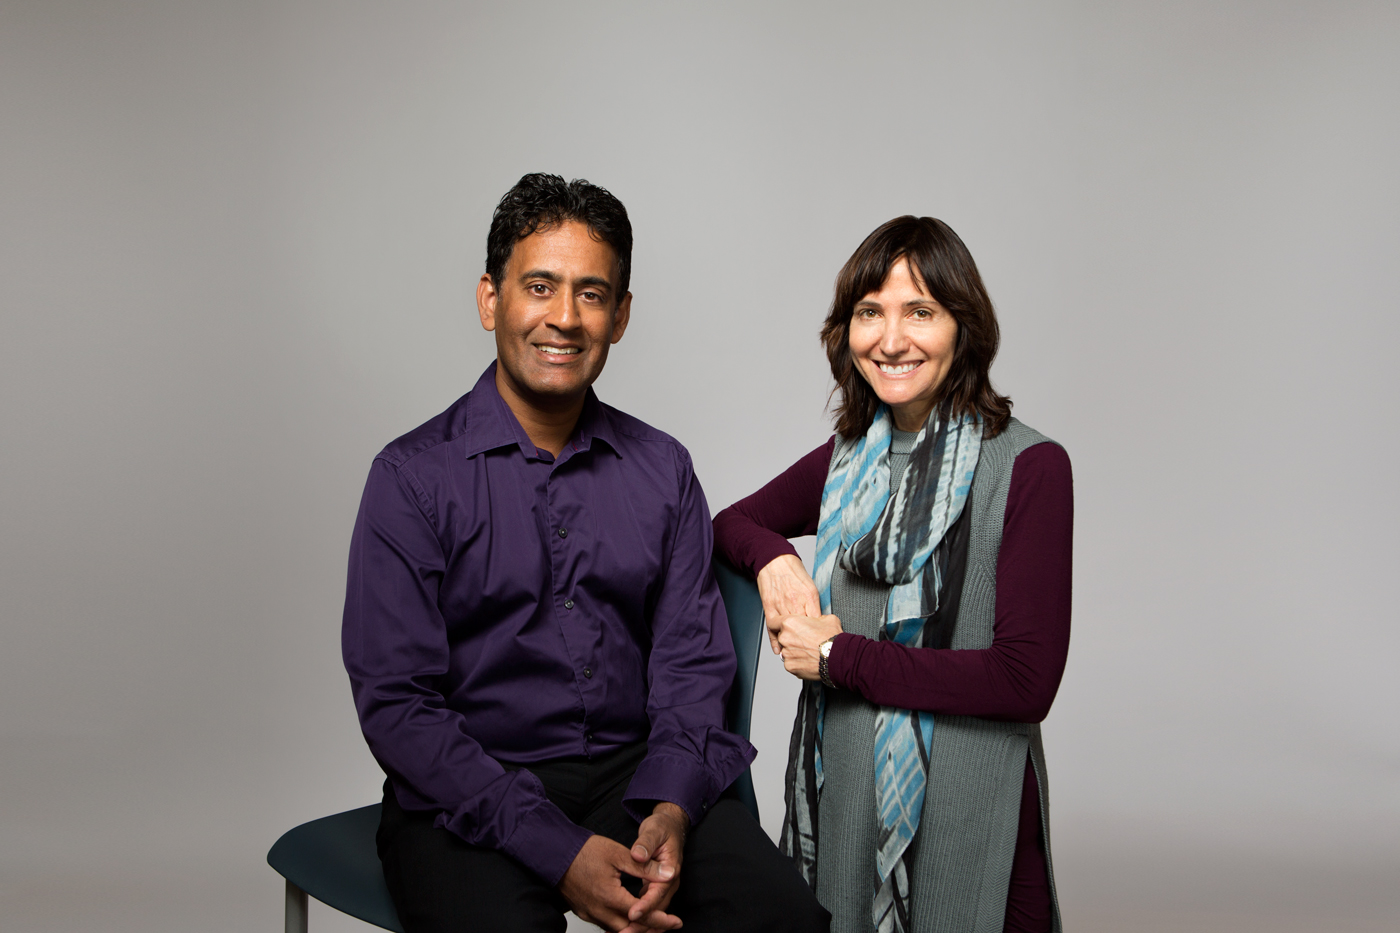 Drs. Ravi Ratnakaran and Denice Feig for Sinai Health magazine.